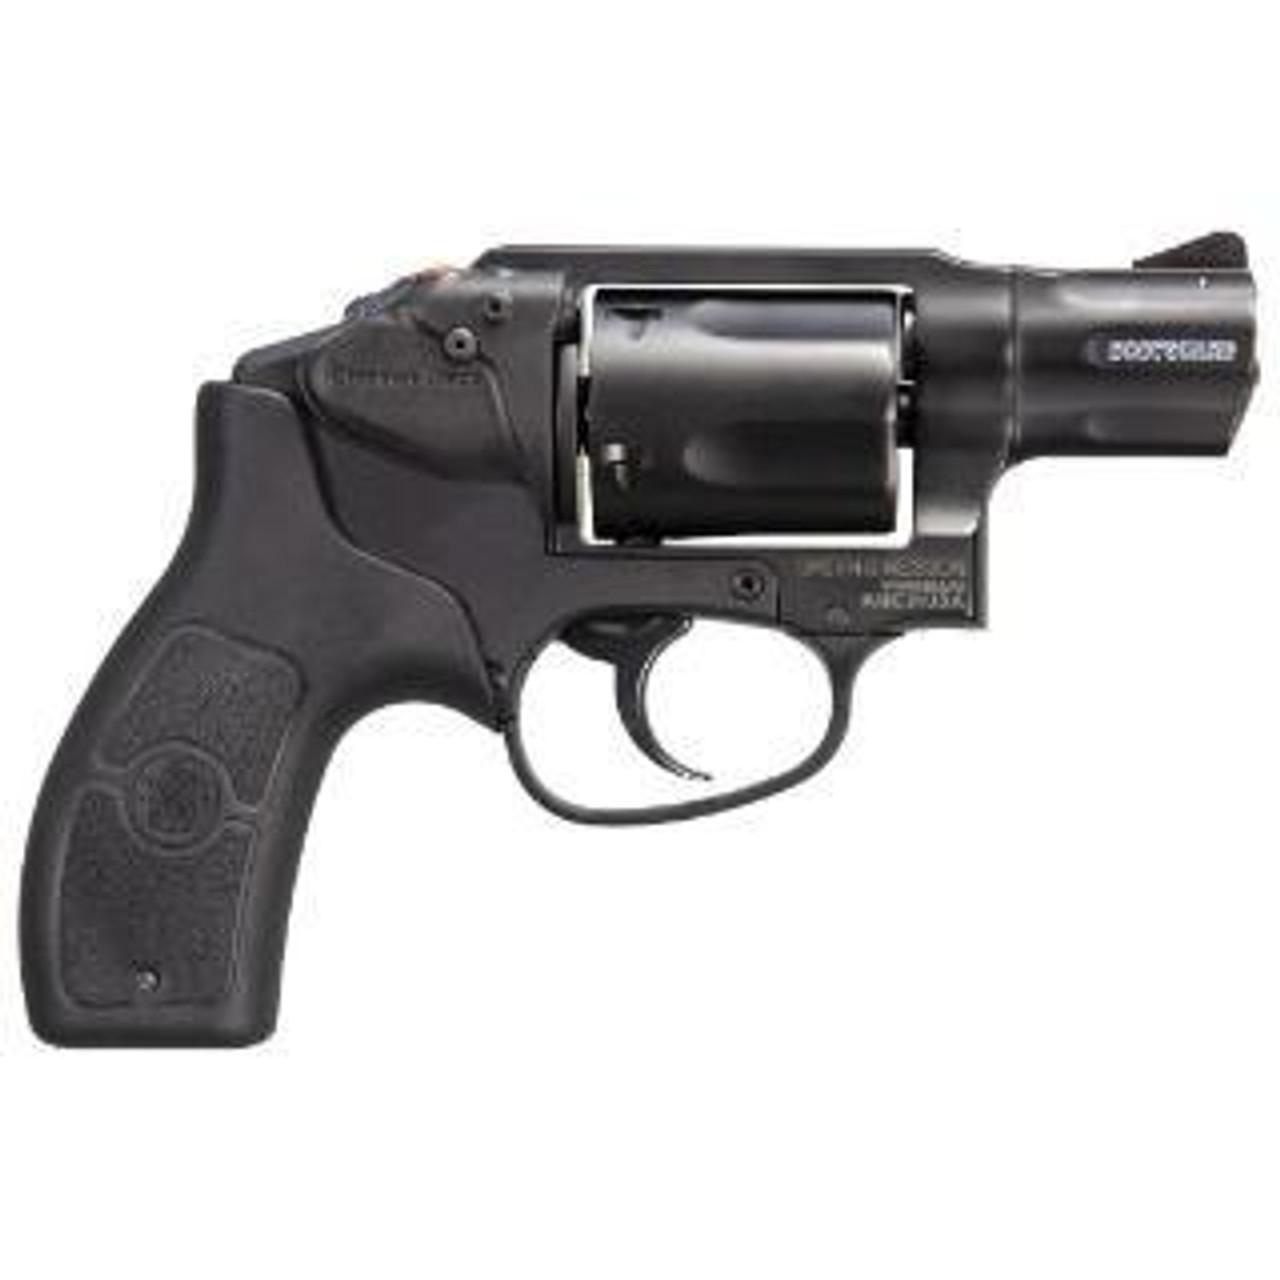 S&W M&P Bodyguard 38 WITH CRIMSON LASER CALIFORNIA LEGAL- .38Spl